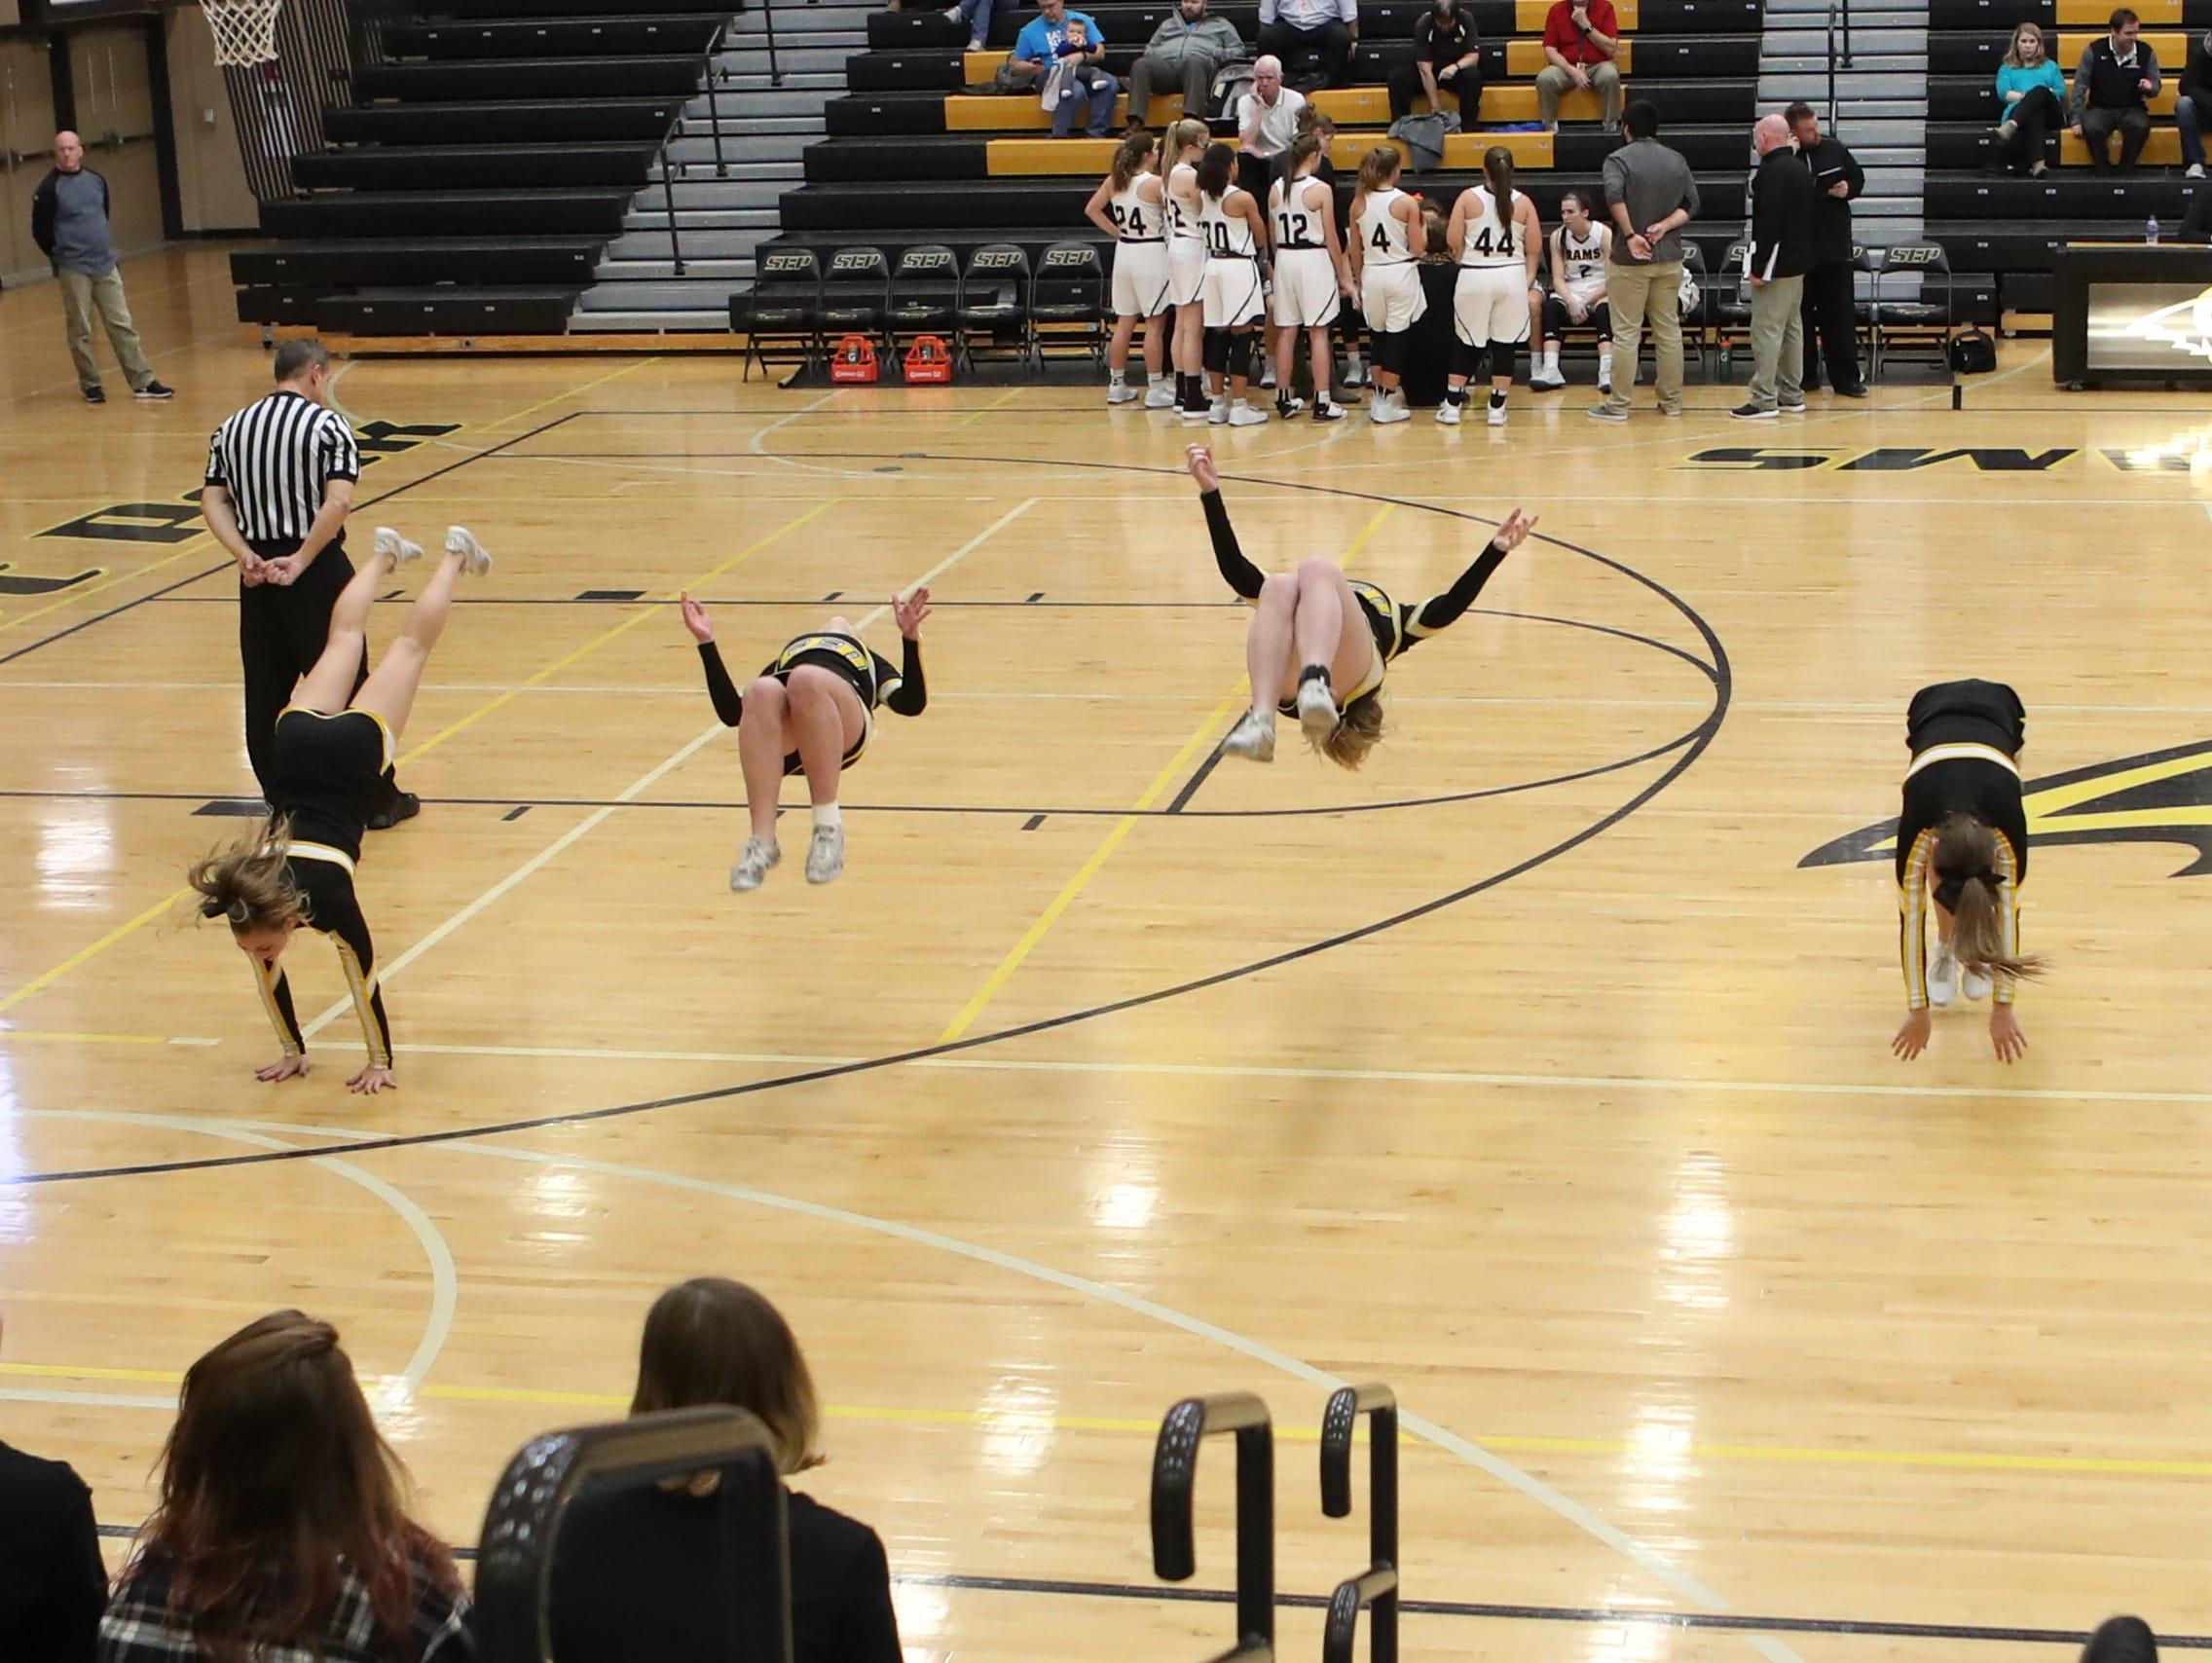 Southeast Polk Rams Cheer Squad performs at Southeast Polk High School.